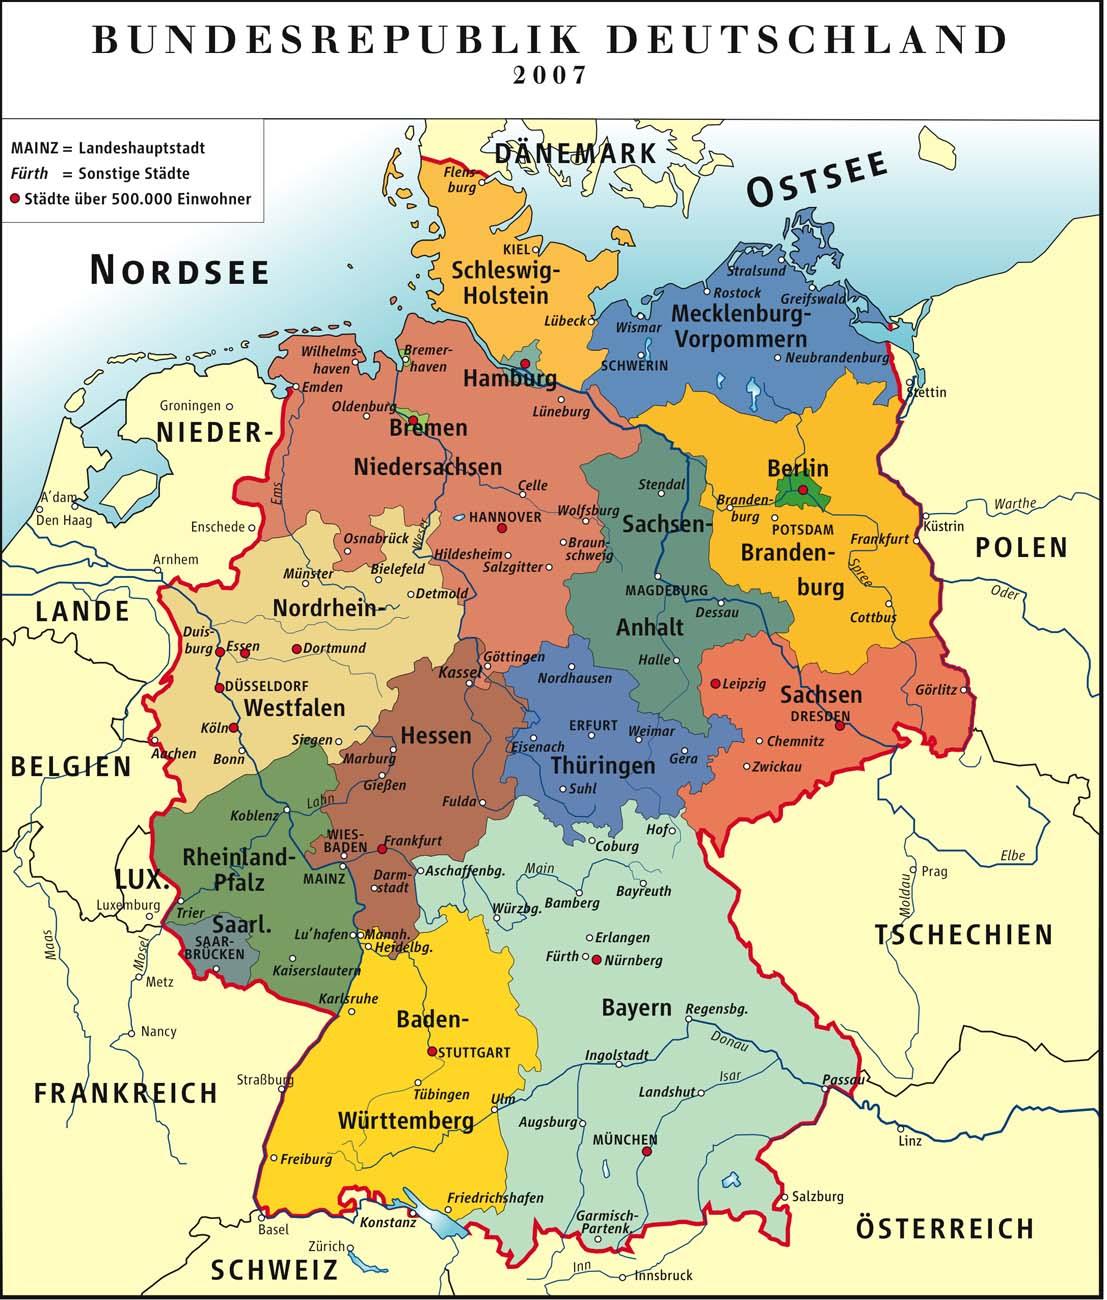 b15bacb29084c معلومات عن ألمانيا - Cultural Office Berlin Website